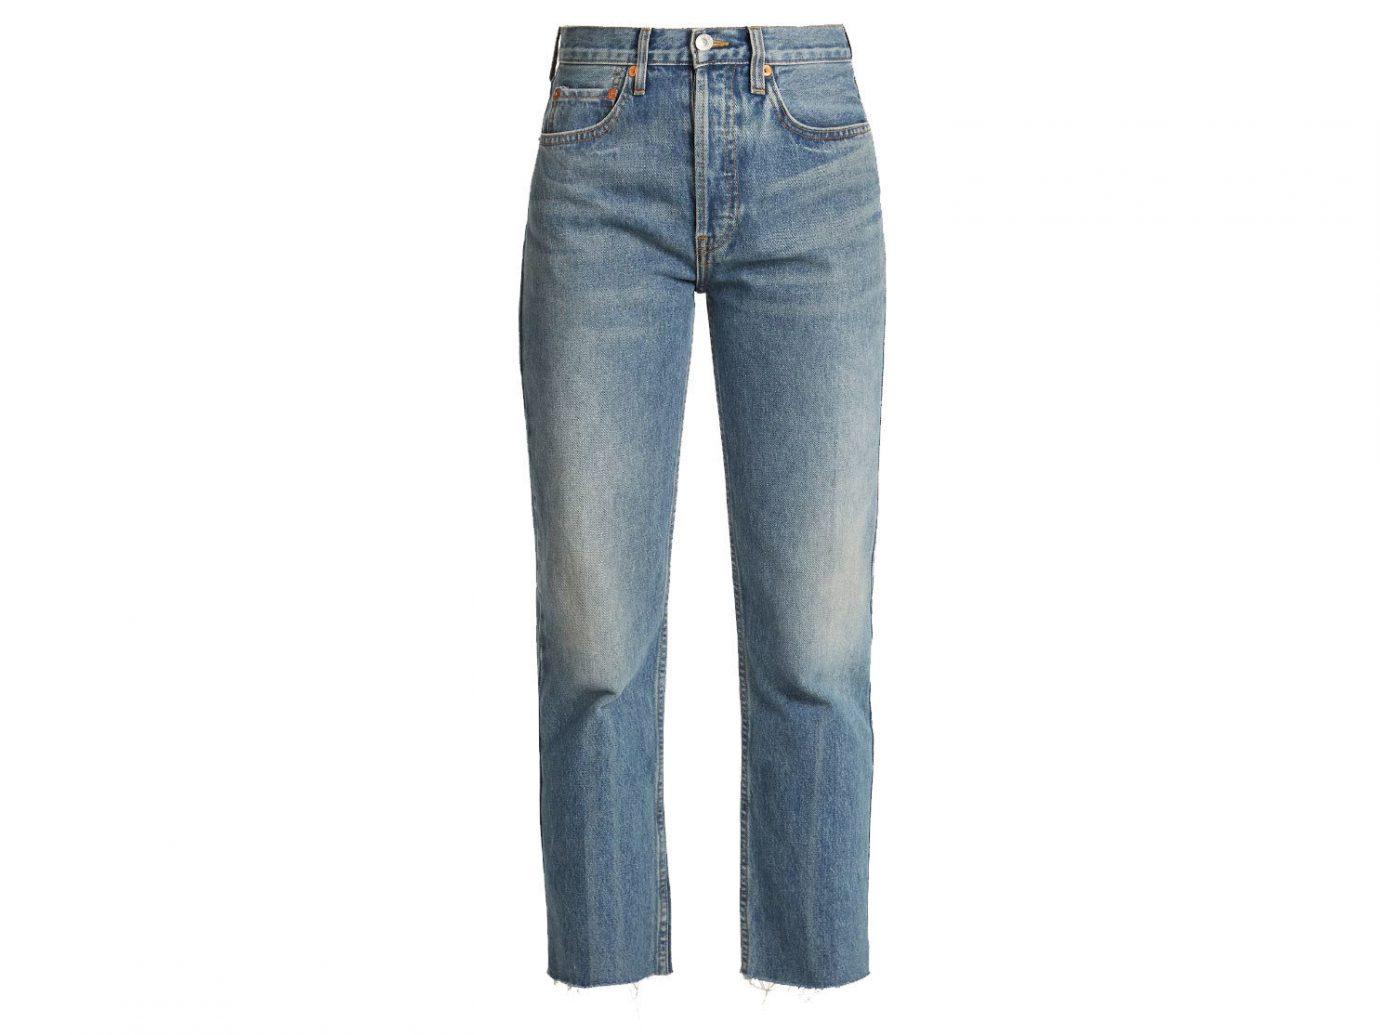 City NYC Style + Design Travel Shop denim jeans pocket trousers product carpenter jeans